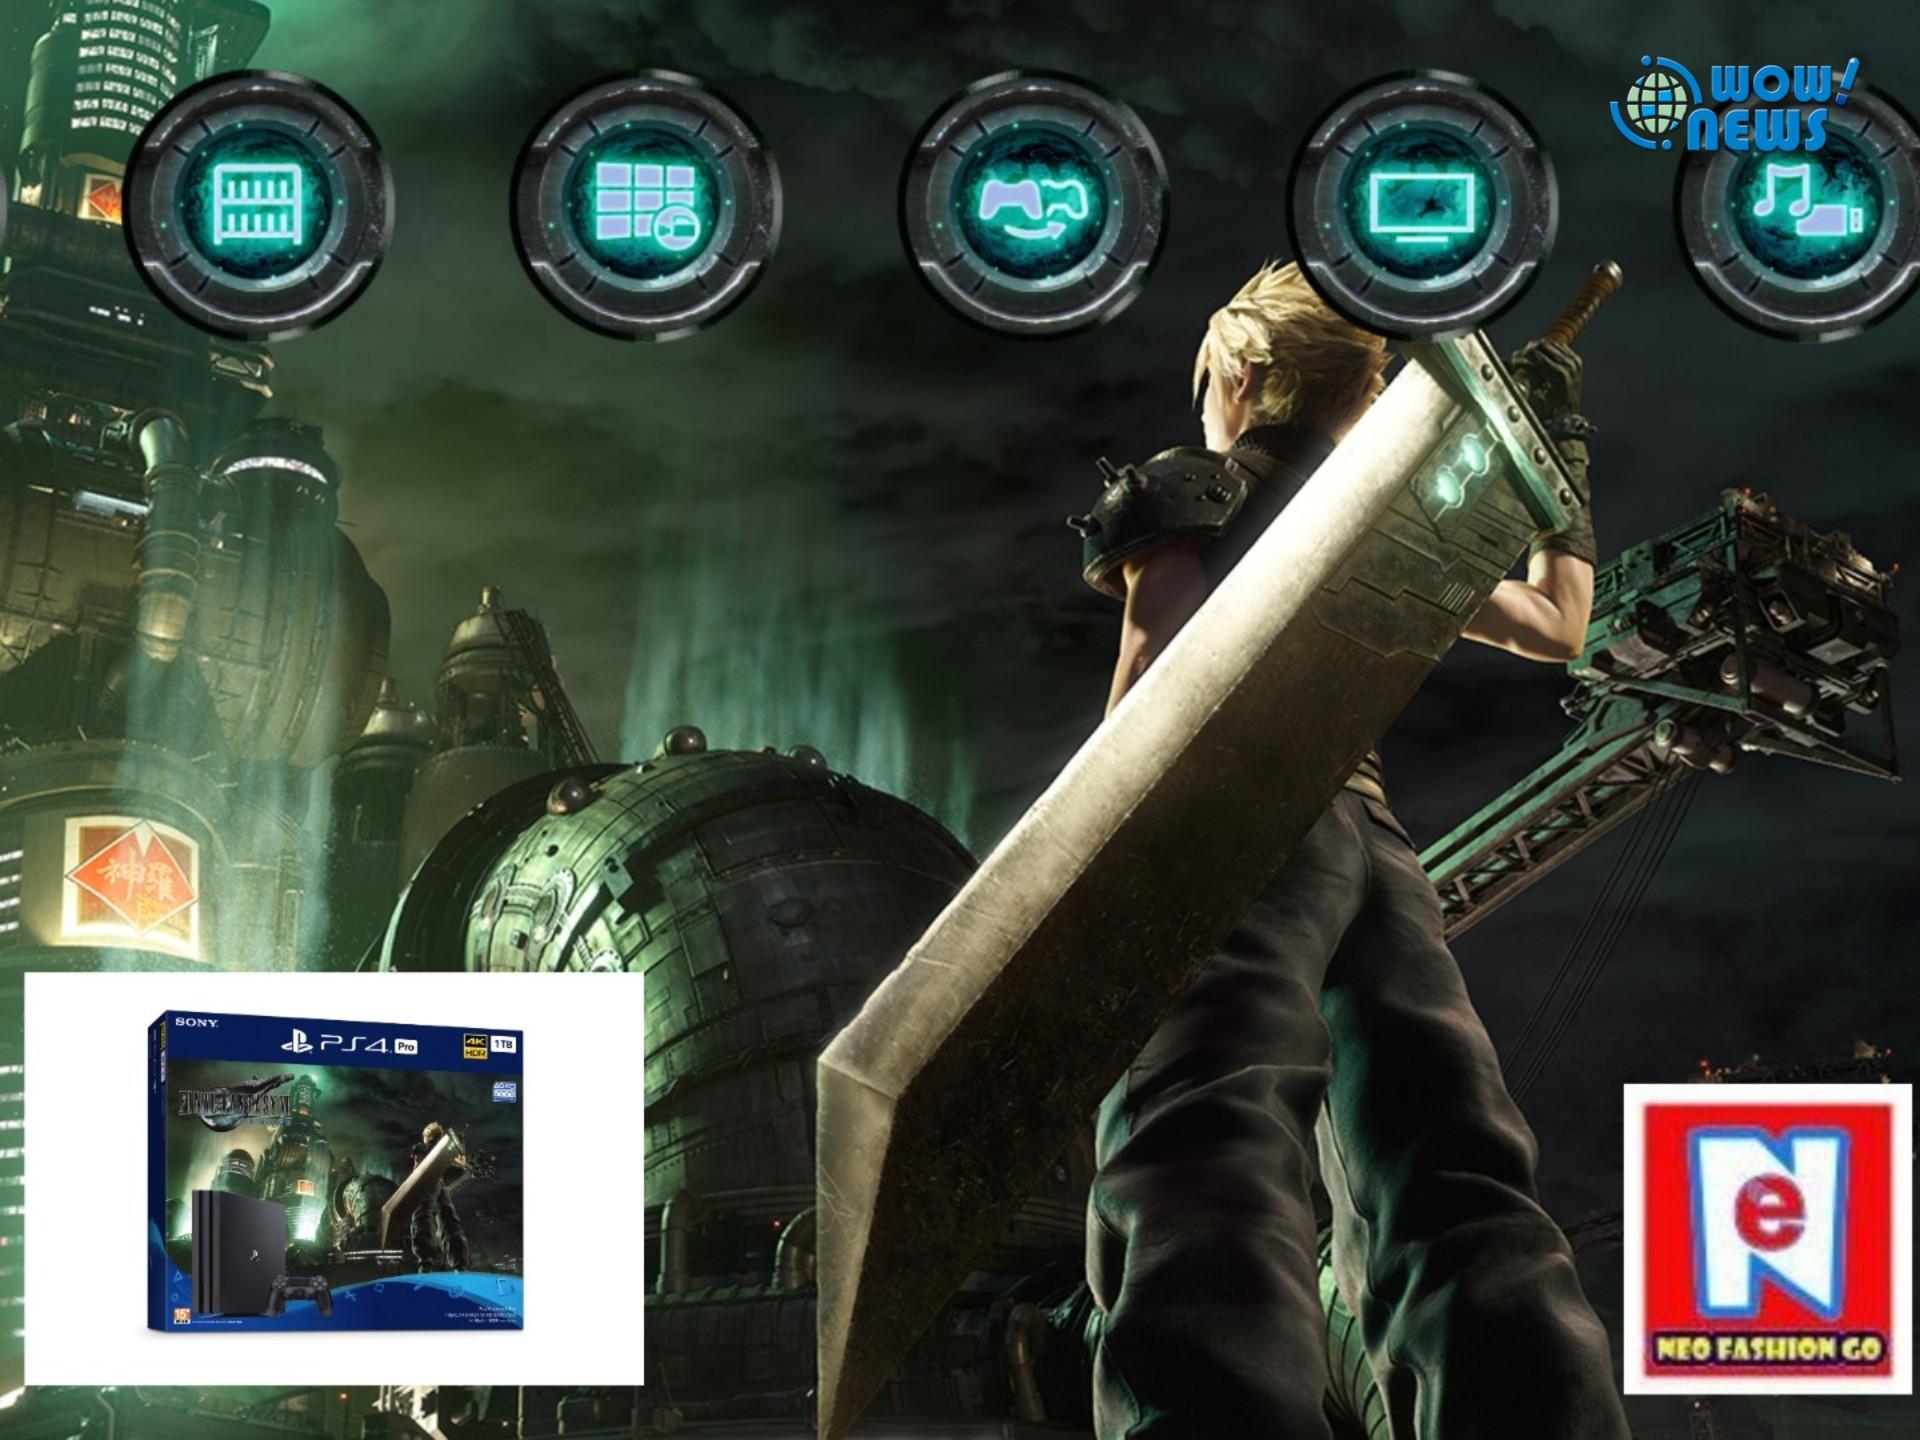 PlayStation®4 Pro「FINAL FANTASY VII REMAKE Pack」組裝熱賣 4月10日限量推出